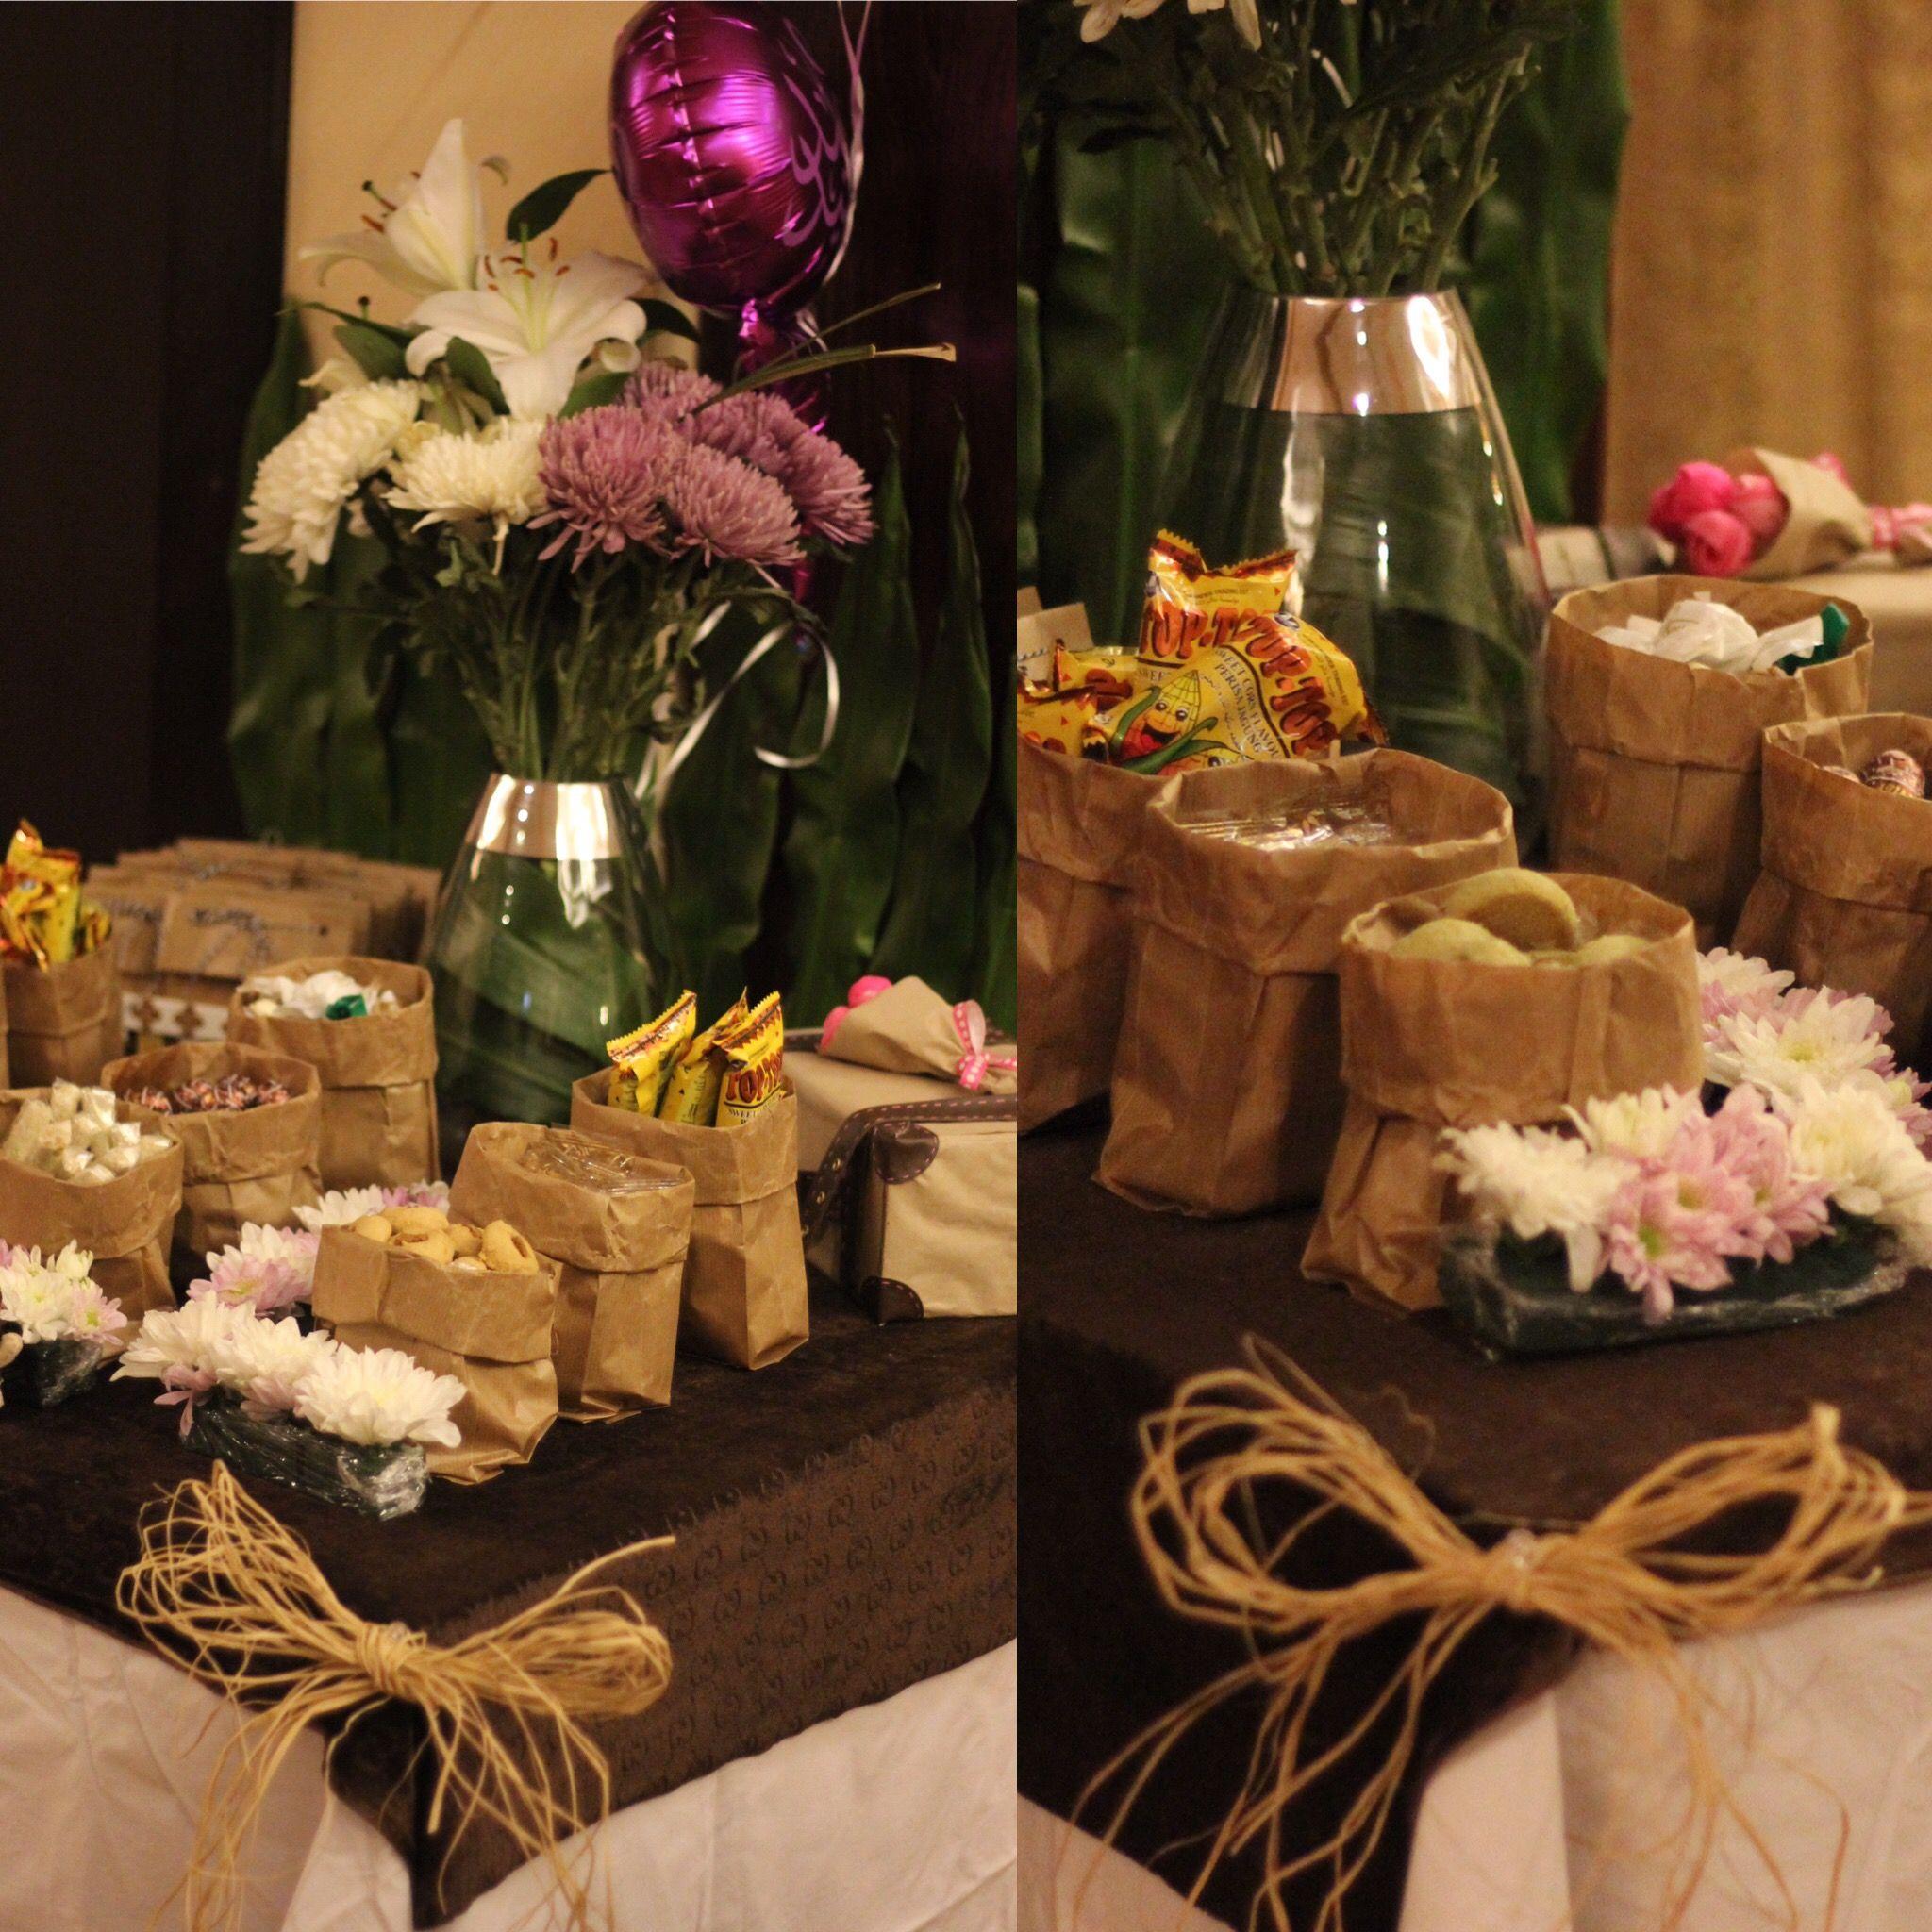 فكره لتقديم طاوله العيد Table Decorations Decor Iphone Wallpaper